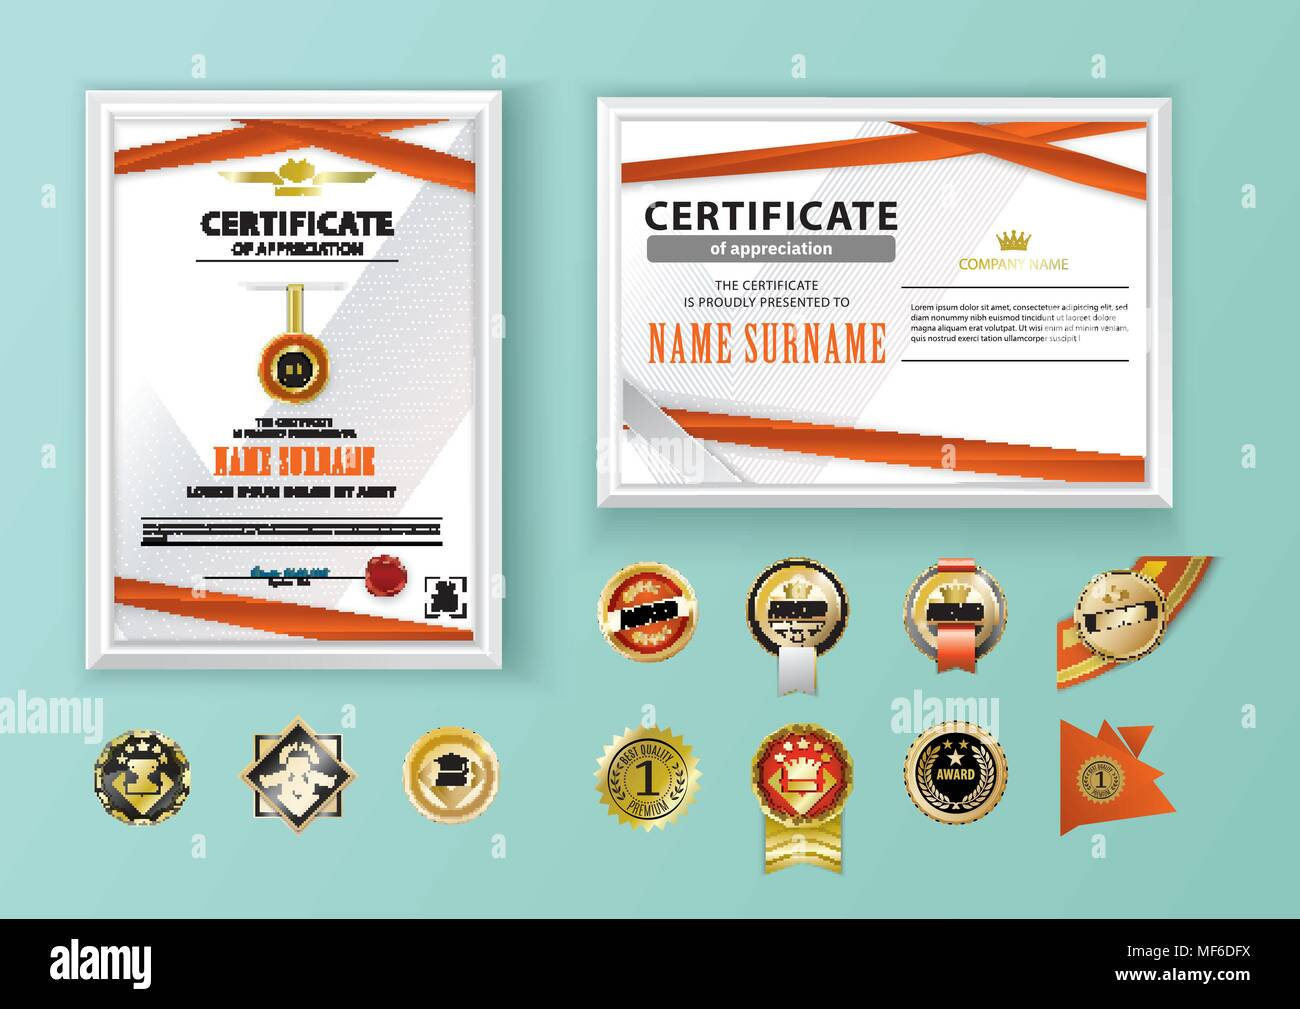 Achievement Badges Stockfotos & Achievement Badges Bilder - Alamy